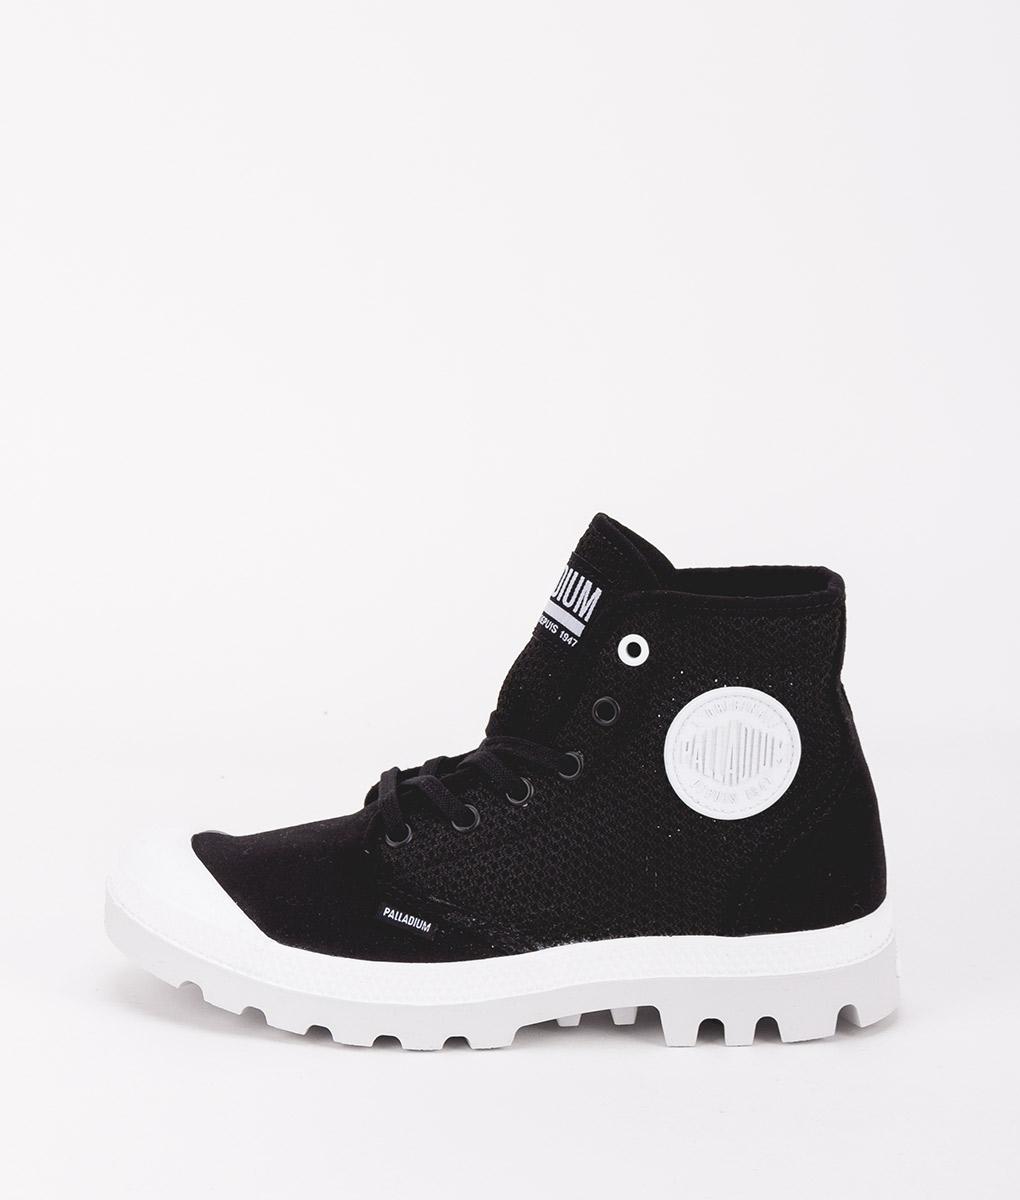 PALLADIUM Unisex Sneakers 75751 PAMPA HI MESH, Black 79.99